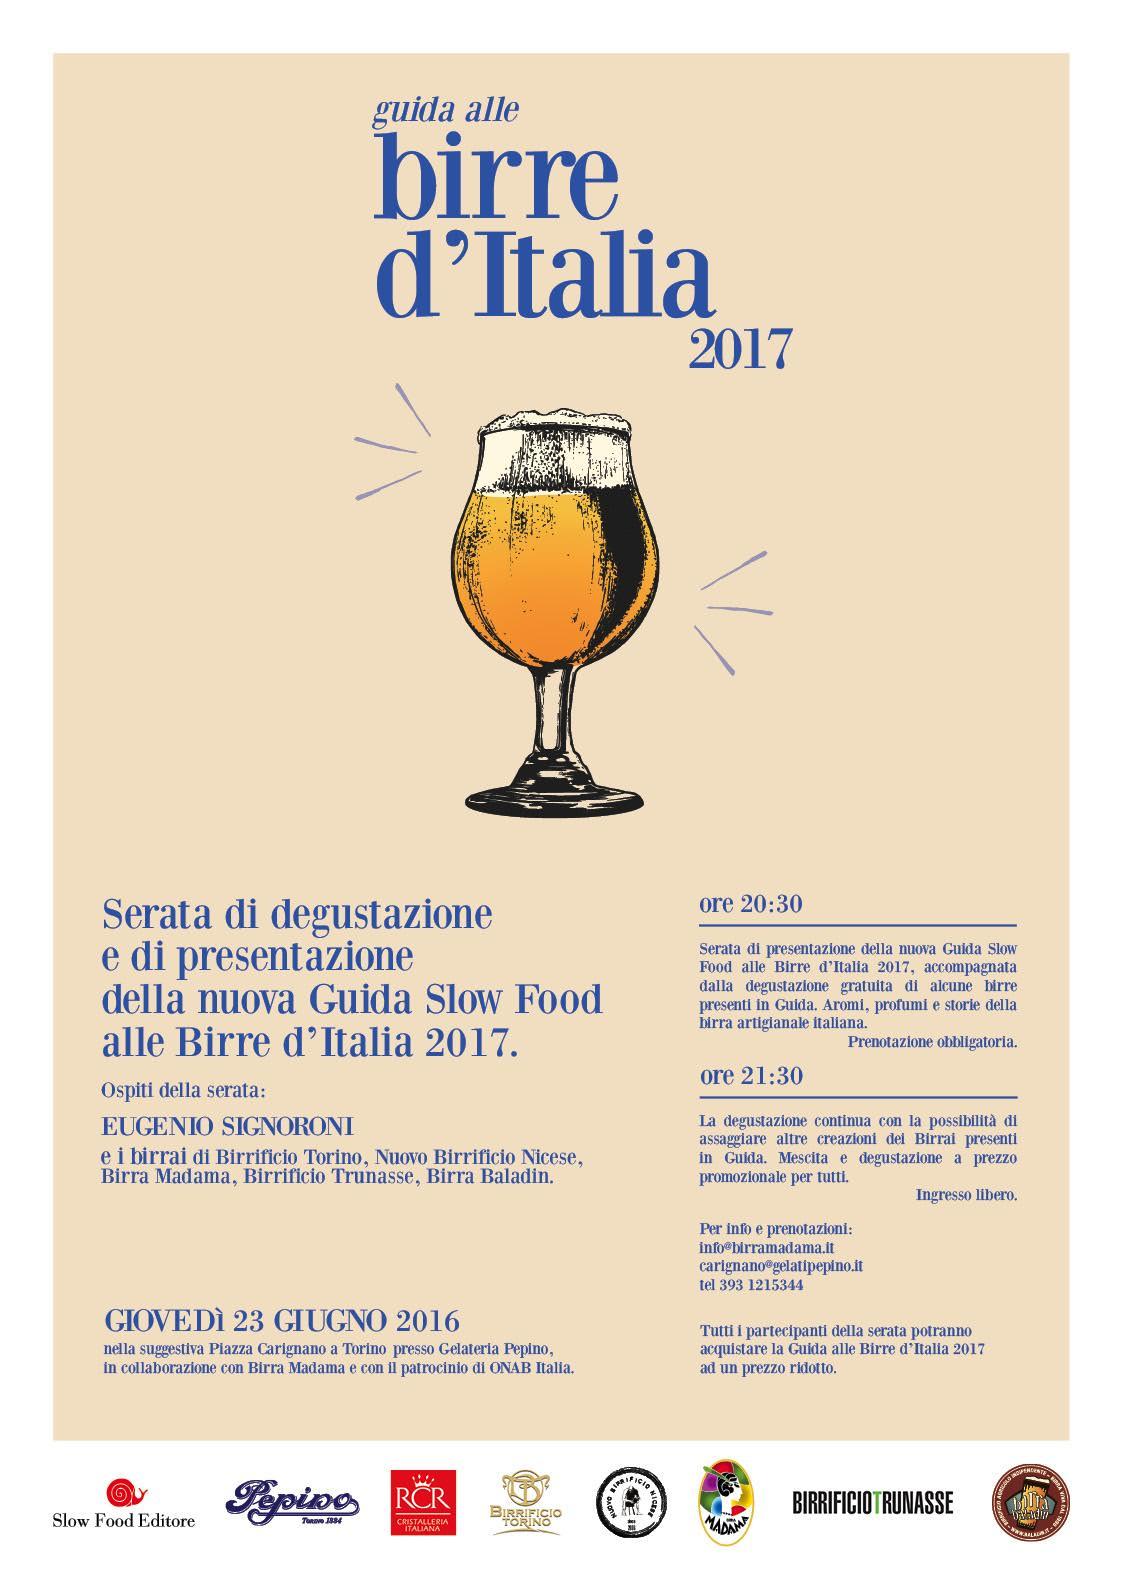 Birre d'Italia